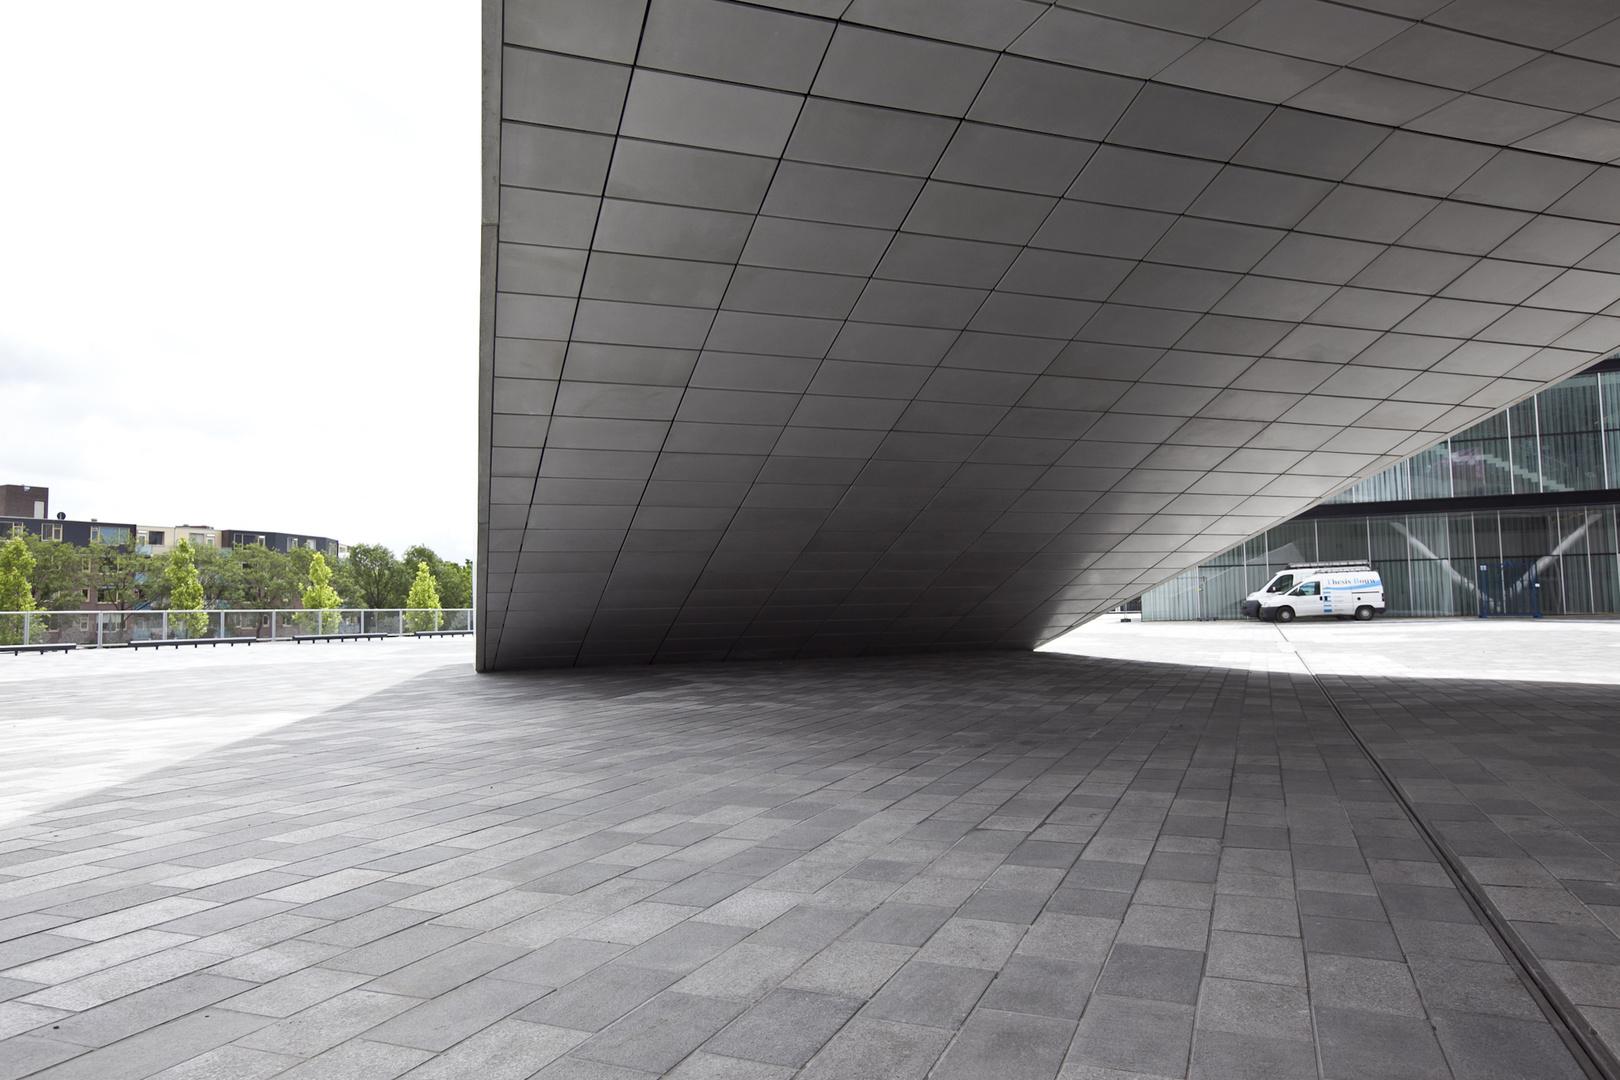 NL_Nieuwegein_Stadhuis_Exterior_2012_RS-26.jpg